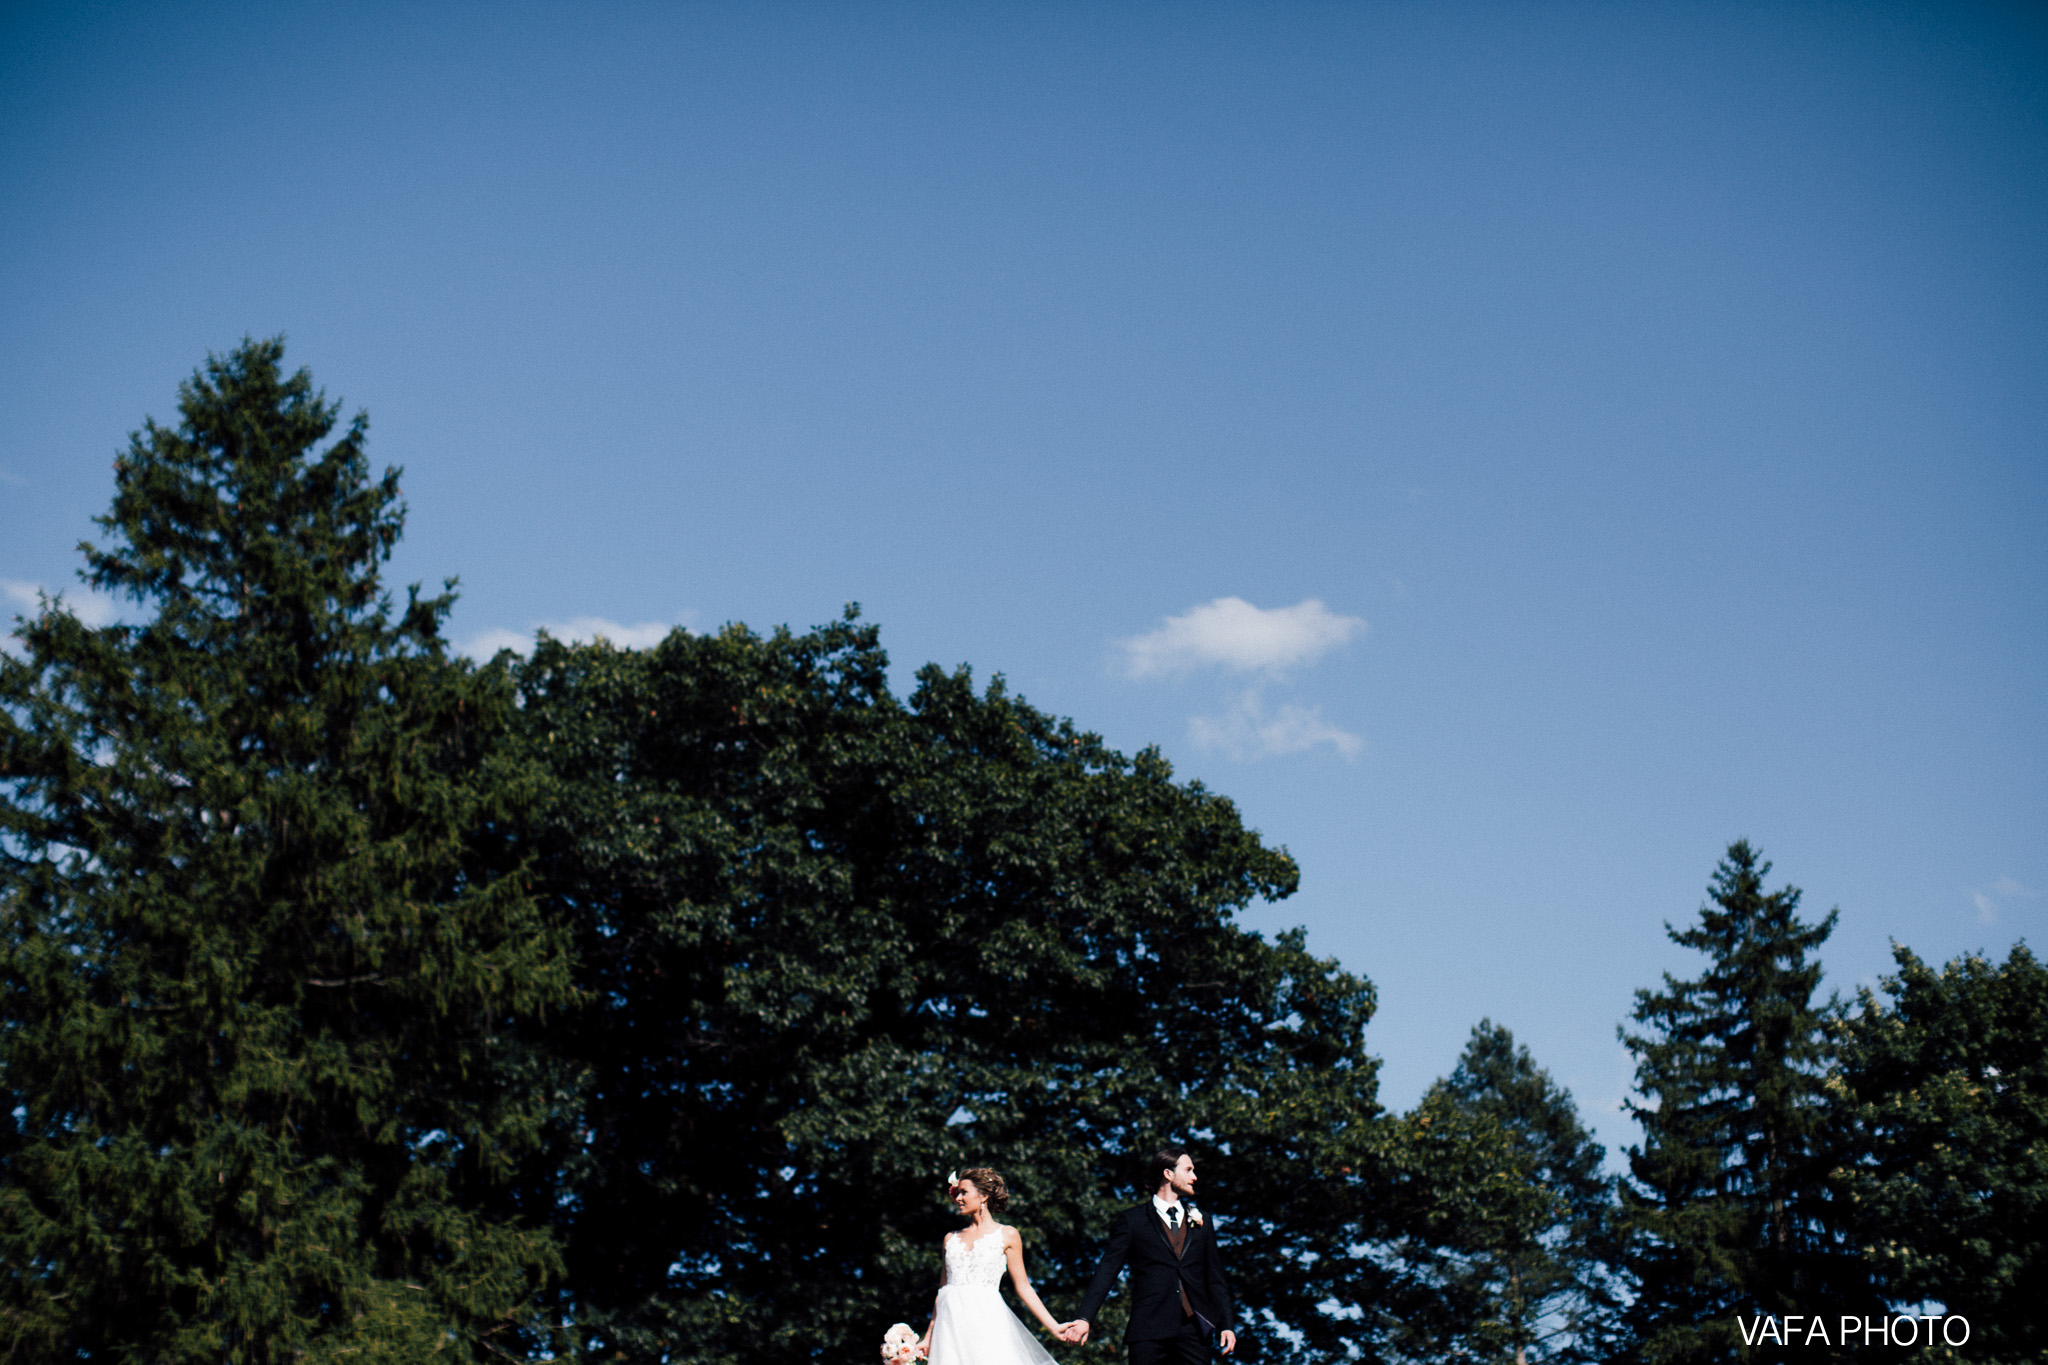 The-Felt-Estate-Wedding-Kailie-David-Vafa-Photo-611.jpg